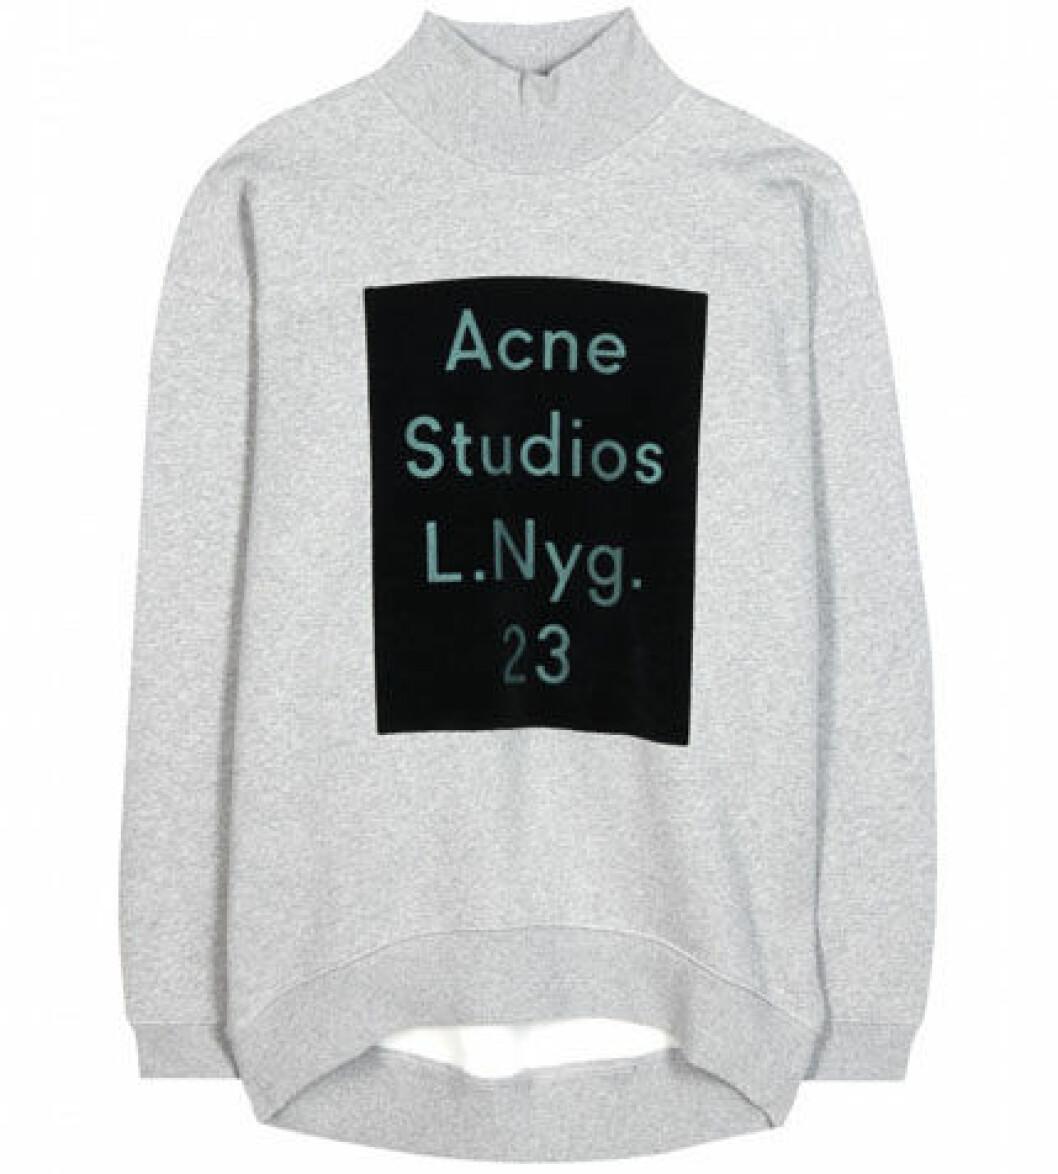 12. Tröja, 2234 kr, Acne studios Mytheresa.com